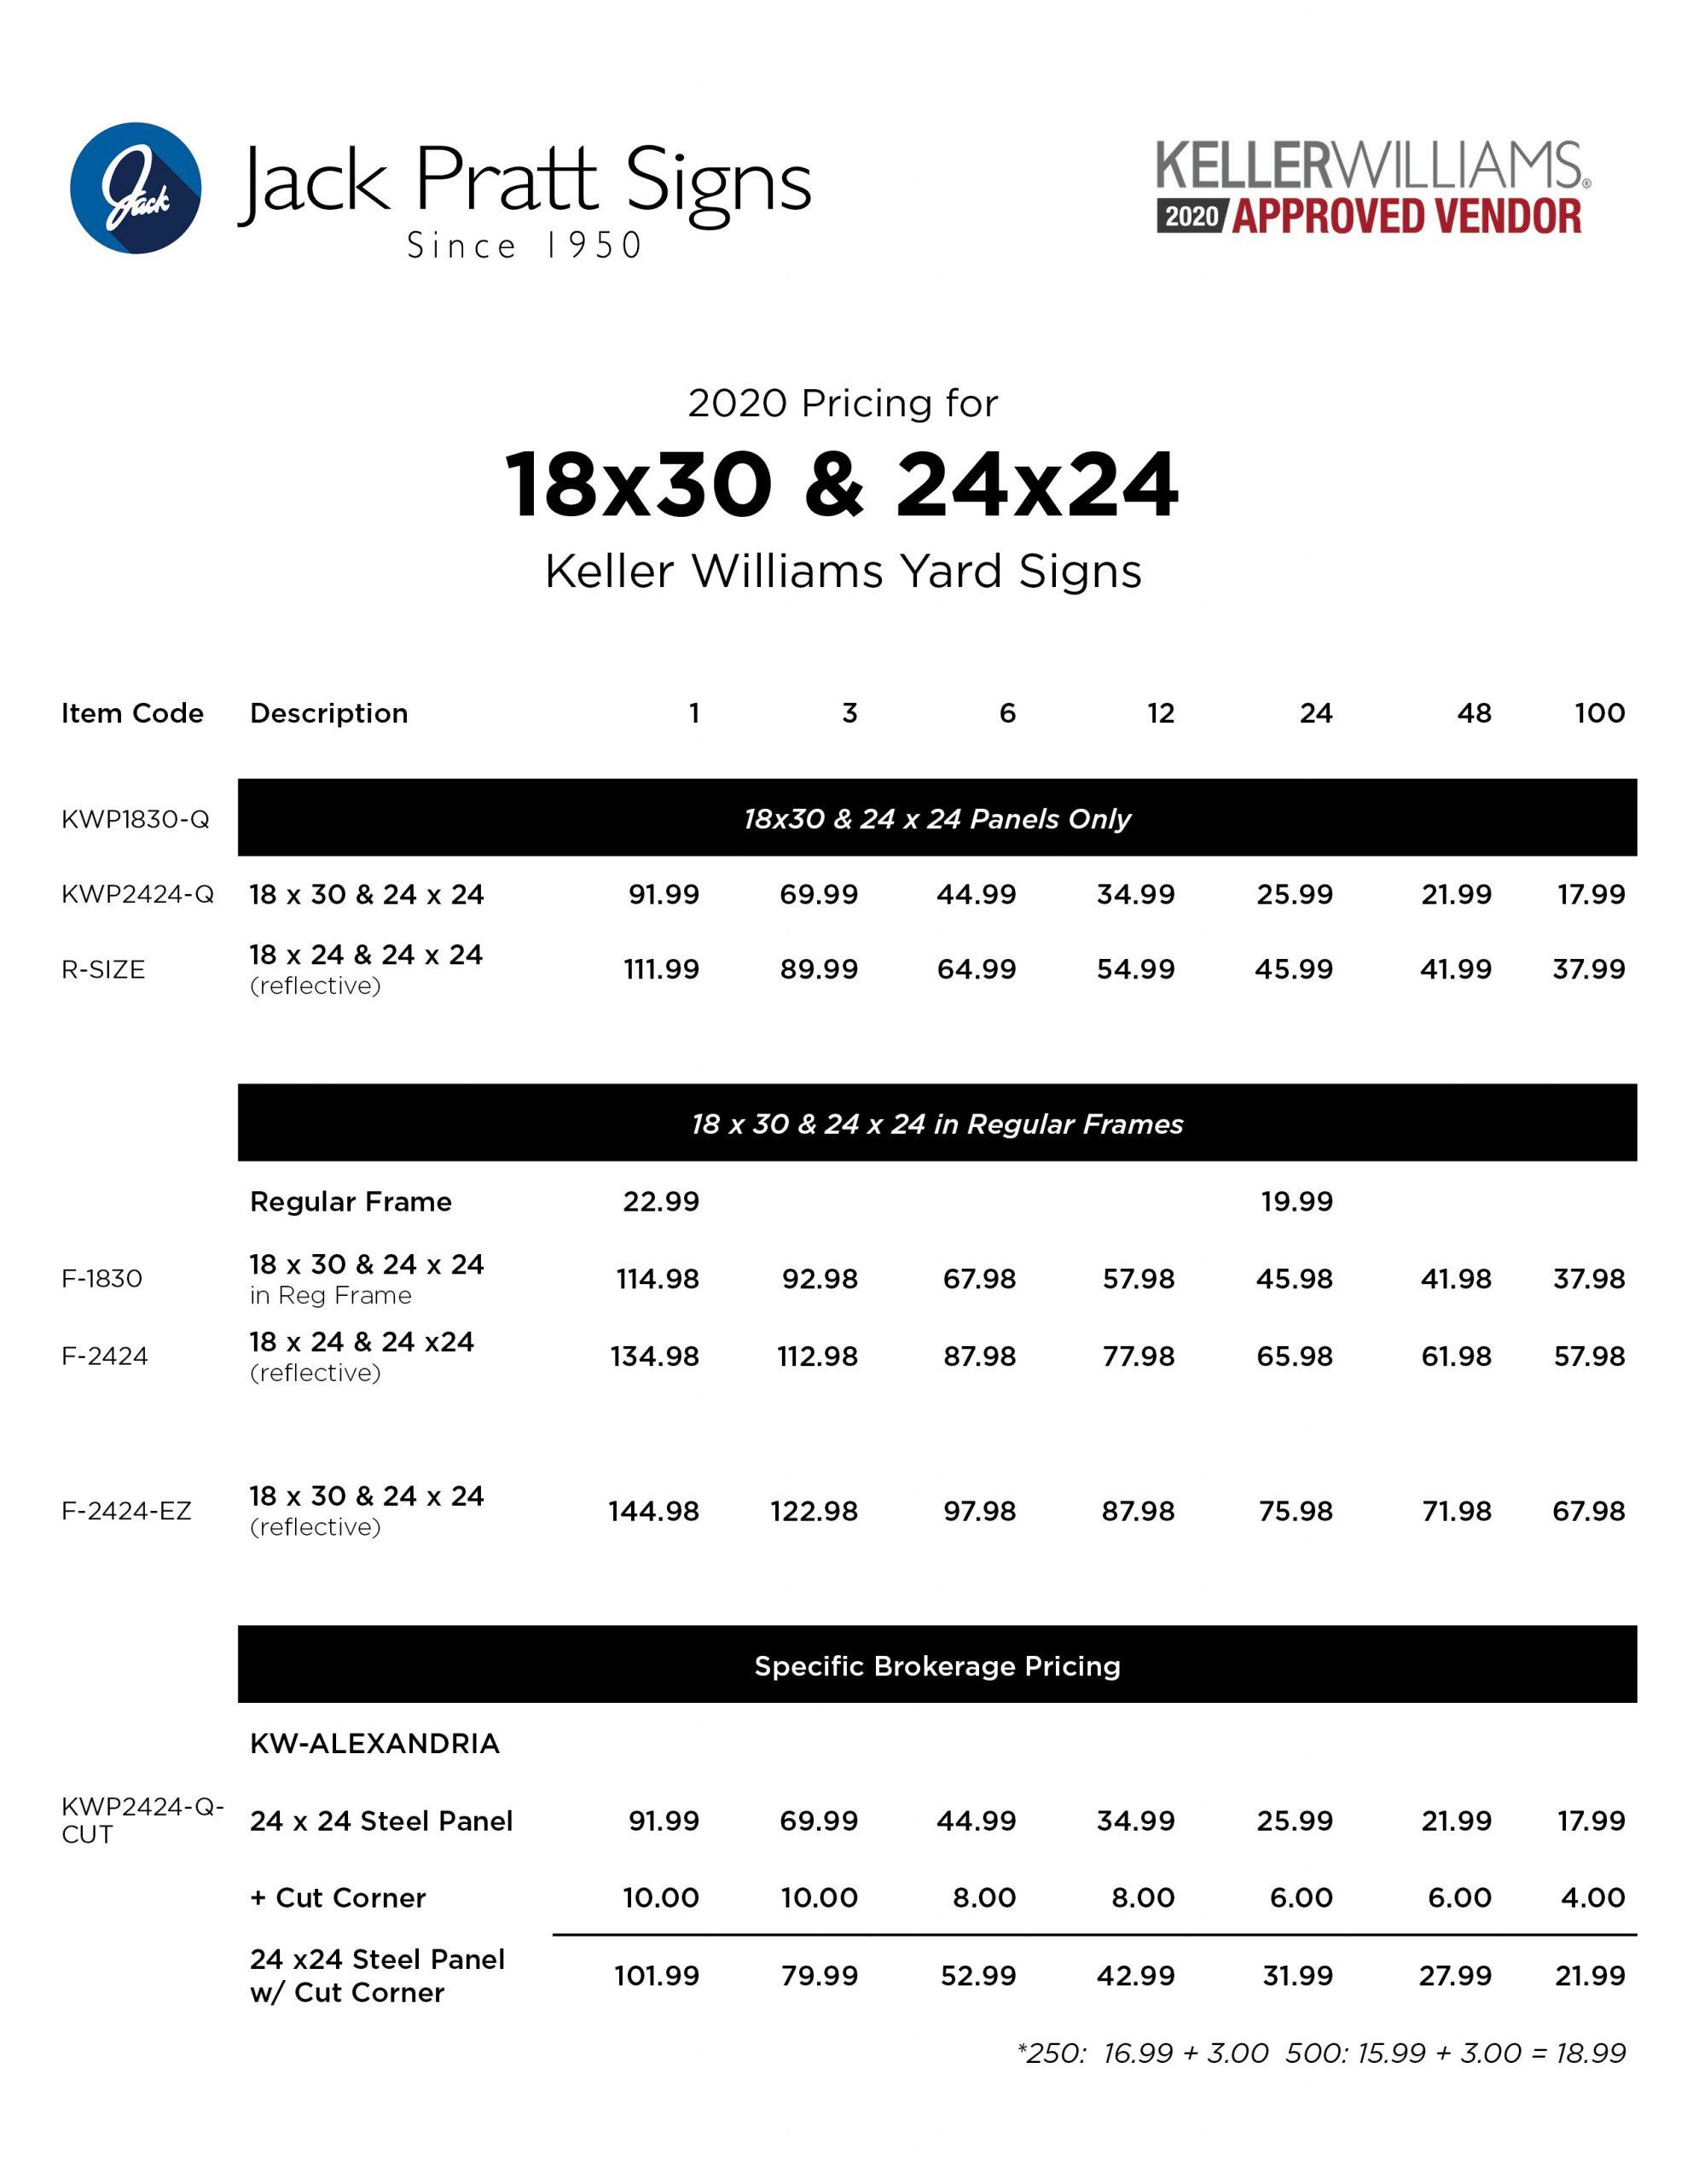 18x30:24x24 pricing